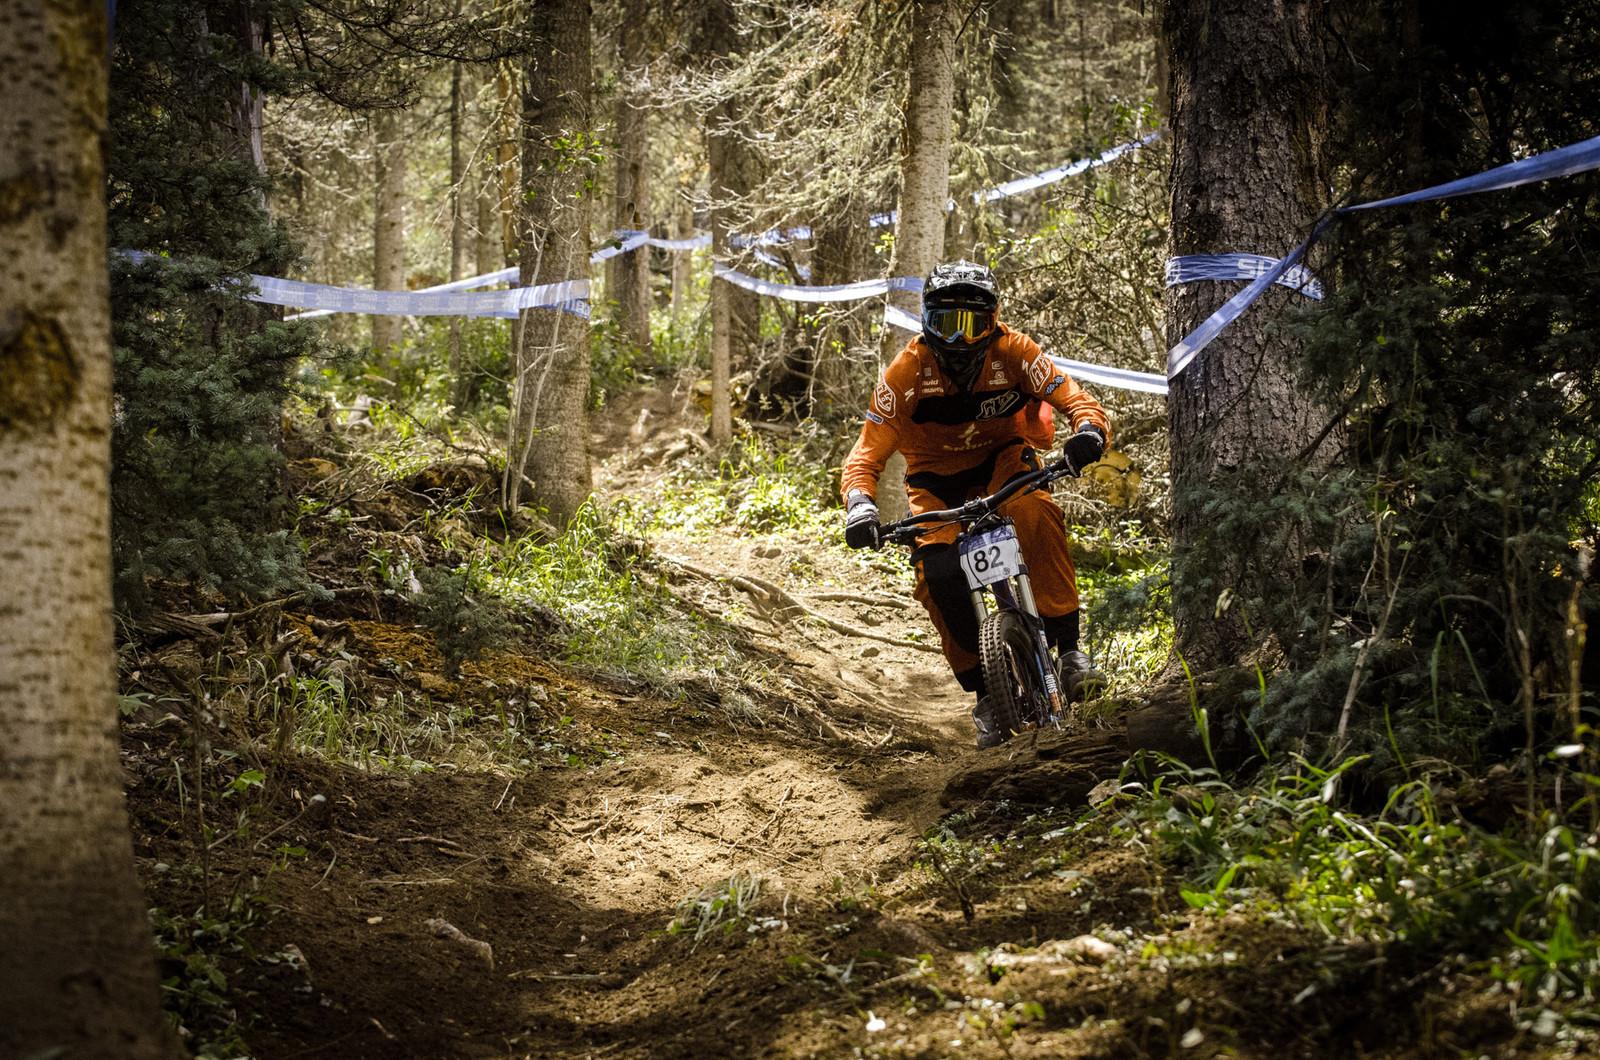 Walker Shaw, U.S. National Champs DH - U.S. National Championship Downhill Finals Photos - Mountain Biking Pictures - Vital MTB